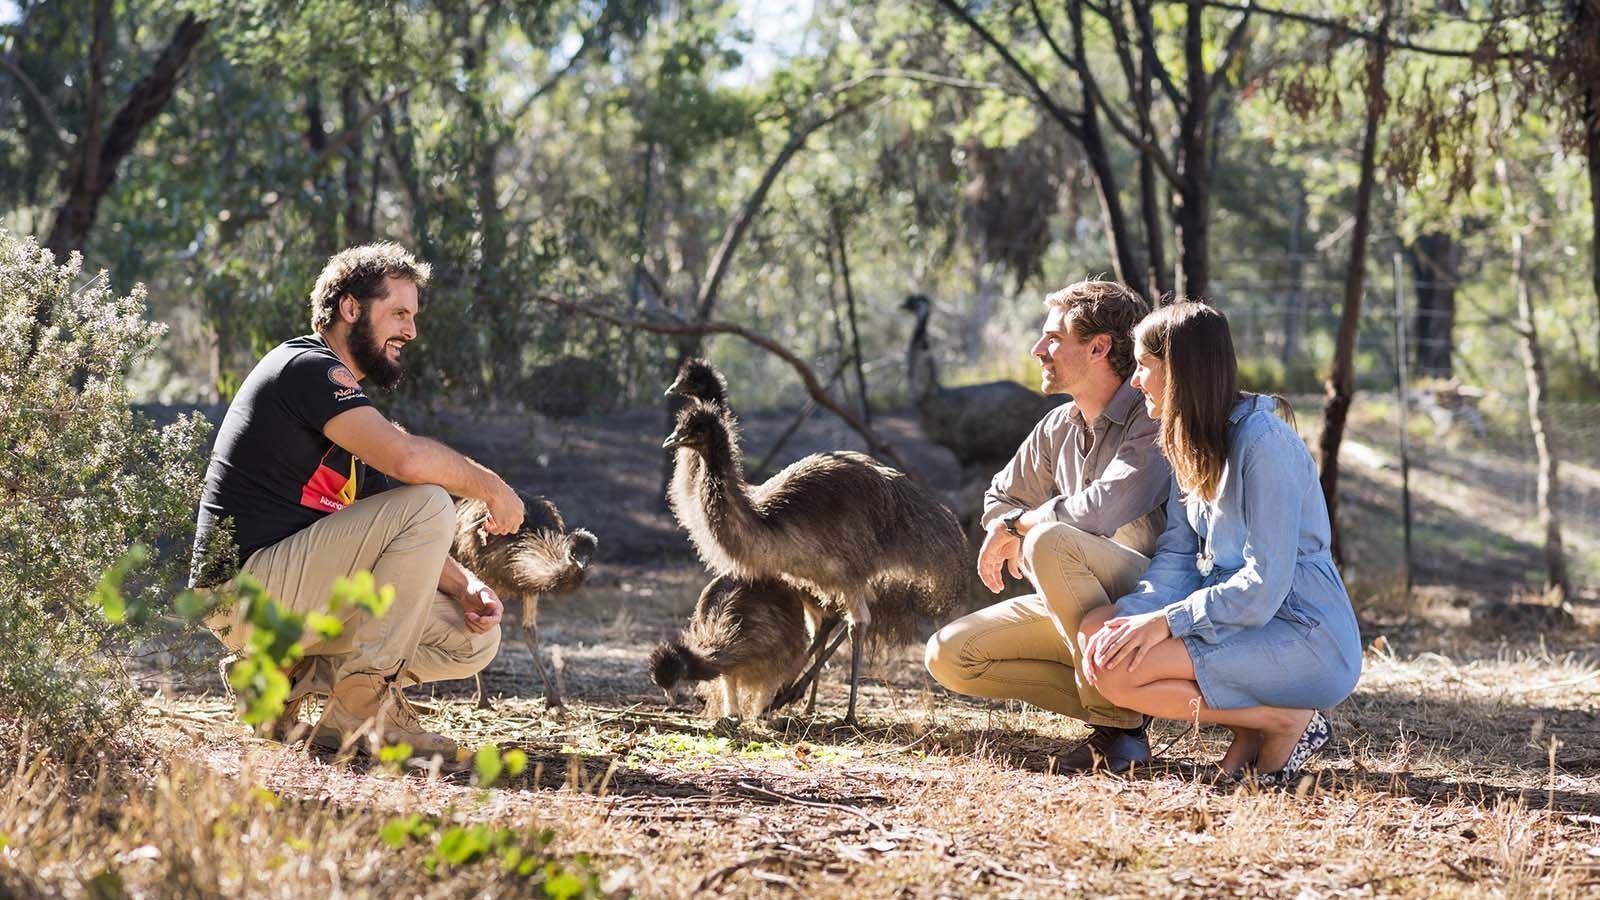 Emus at Narana Aboriginal Culture Centre, Geelong and the Bellarine, Victoria, Australia